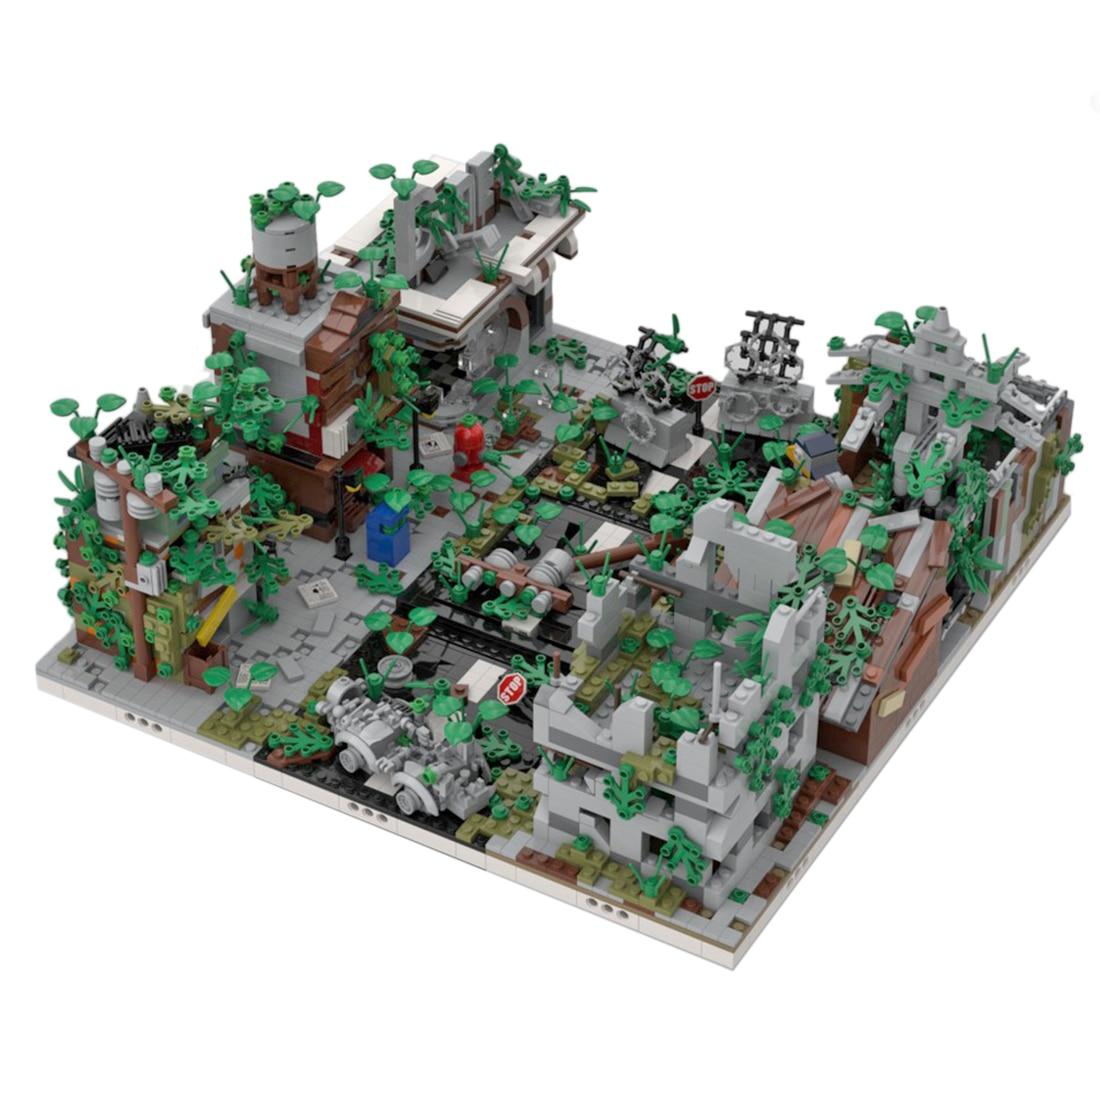 3645Pcs  MOC Ruined City Bricks Small Particle DIY Building Block Stem Toy Gift (Designed By Gabizon) (No User Guide)